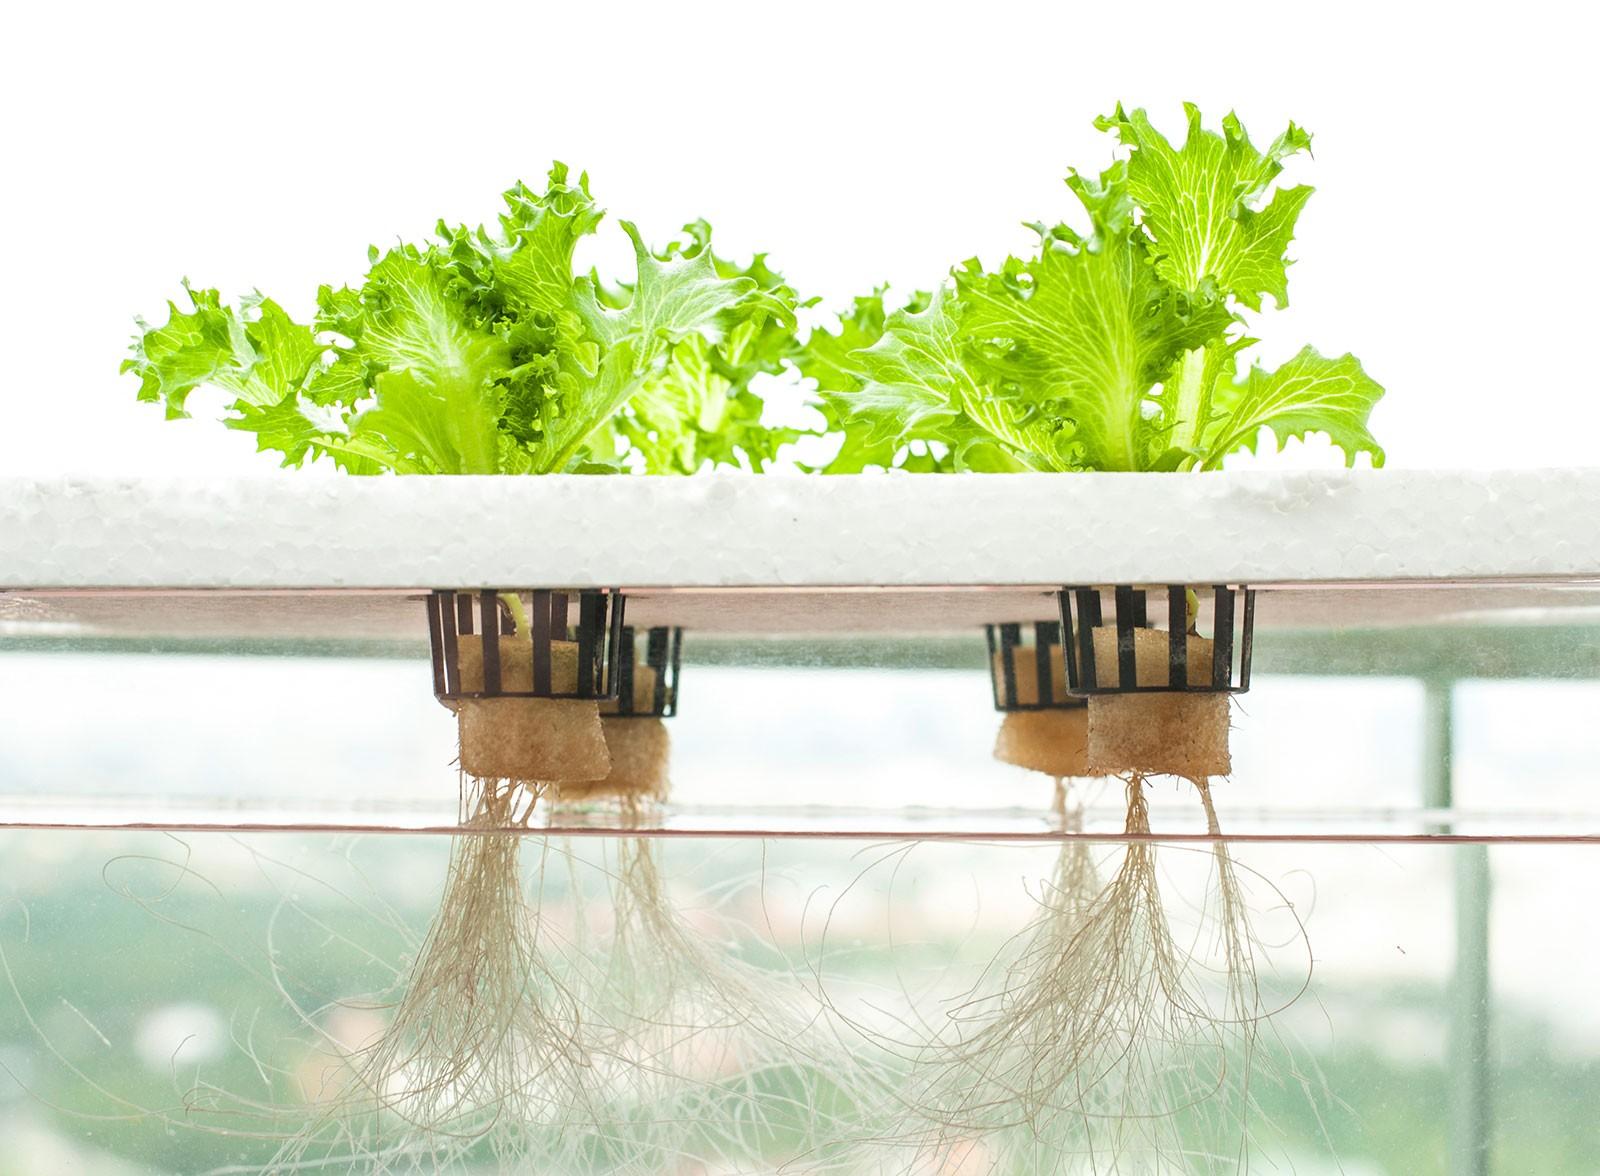 dwc-hydroponics-e1459512409966.jpg